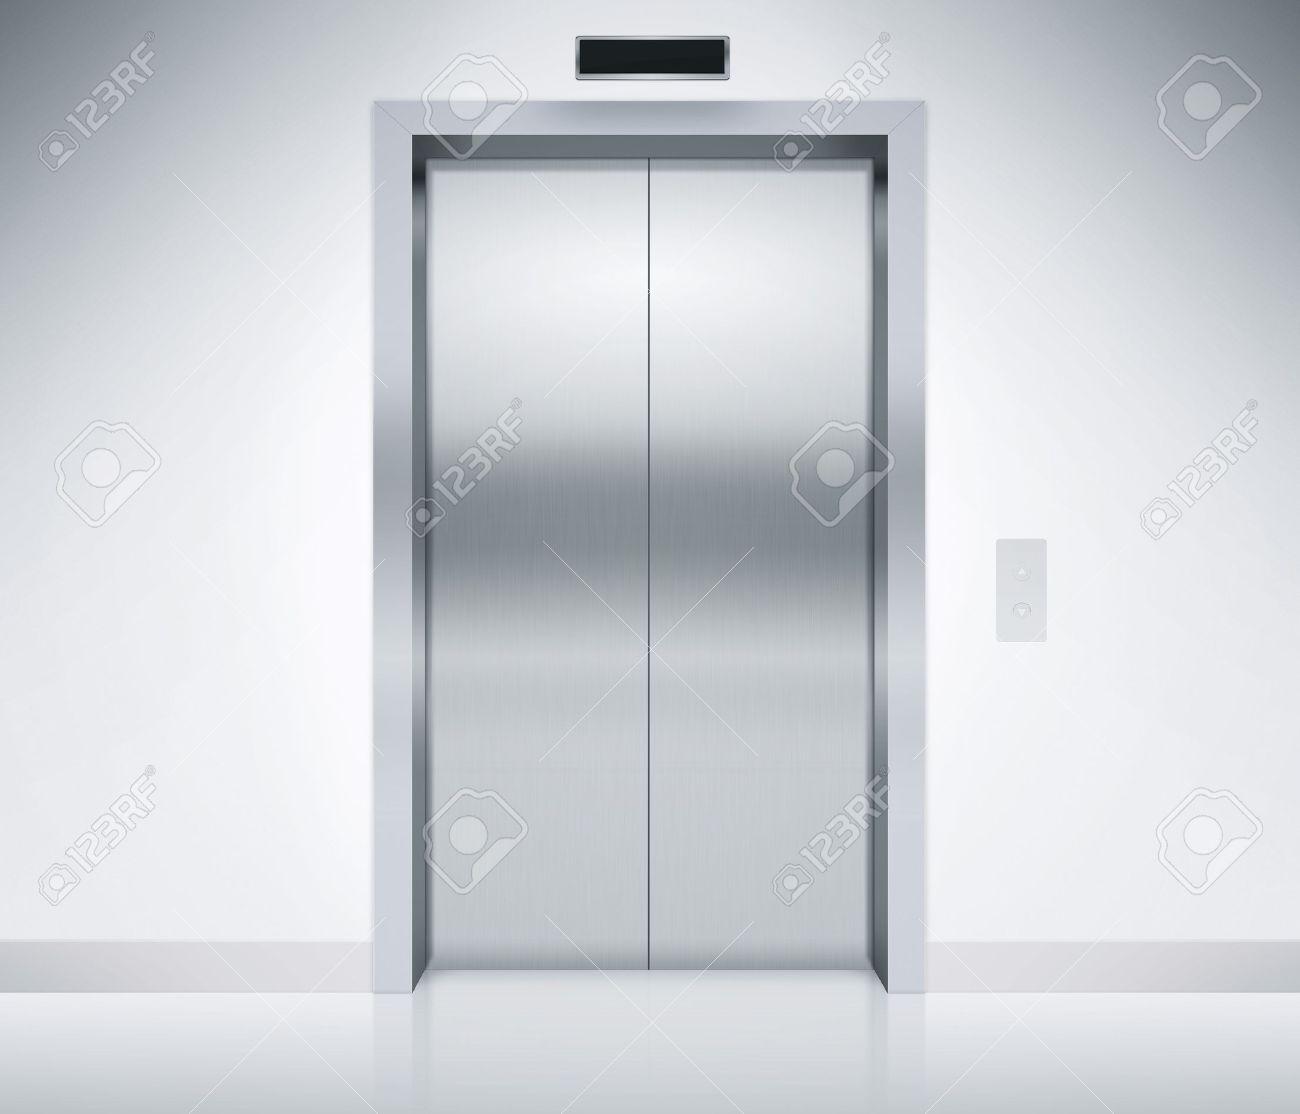 Modern elevator or lift doors made of metal closed in building with lighting. & Push Door Stock Photos. Royalty Free Push Door Images